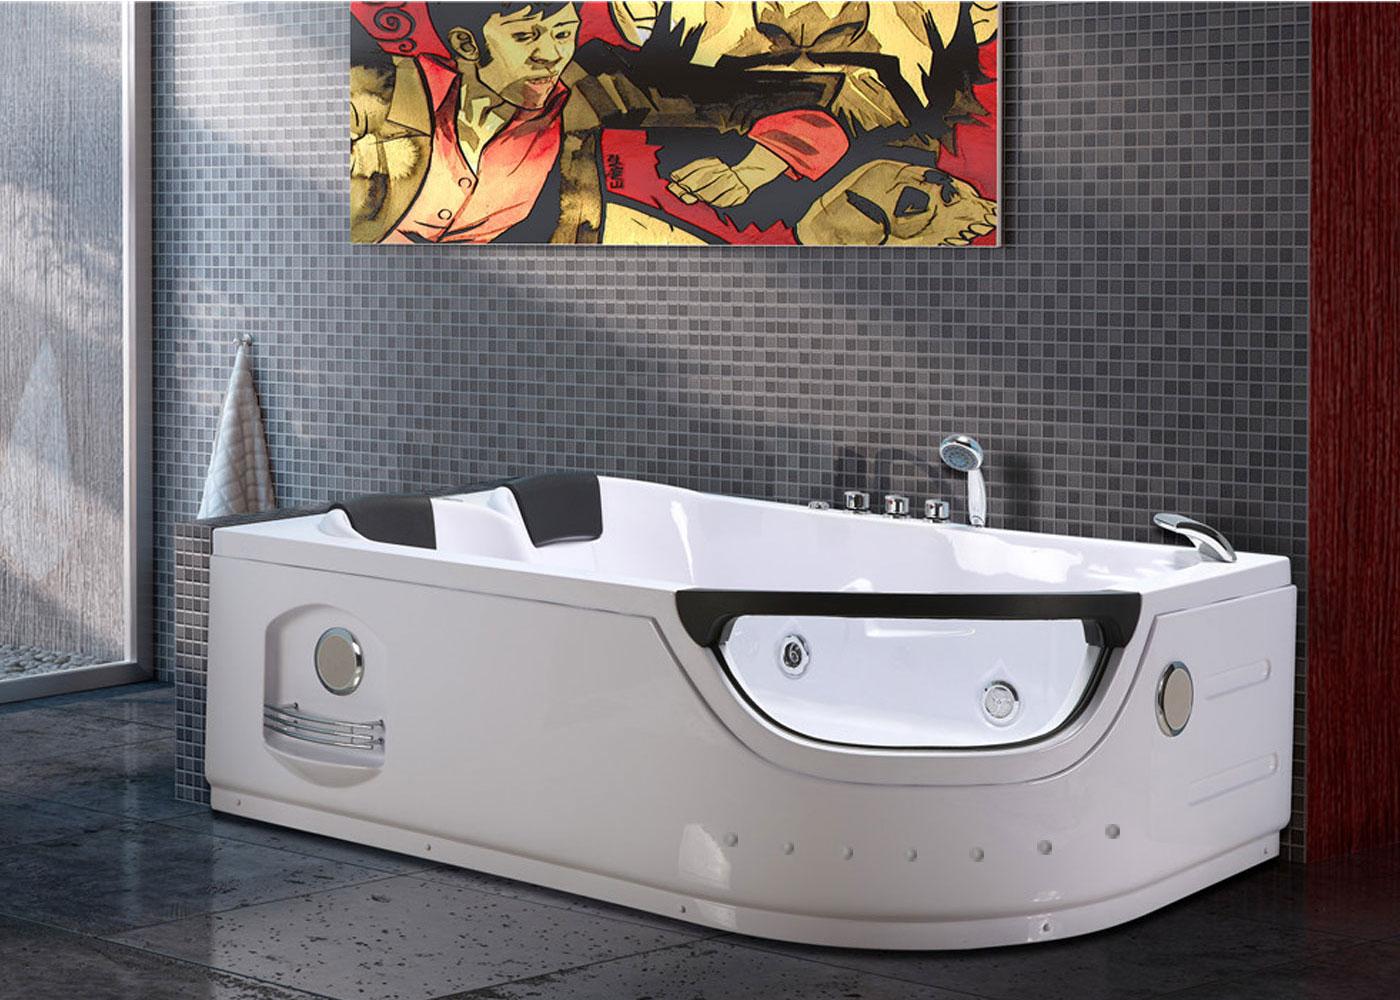 whirpoo-bathtub-hot-tub-Luna1